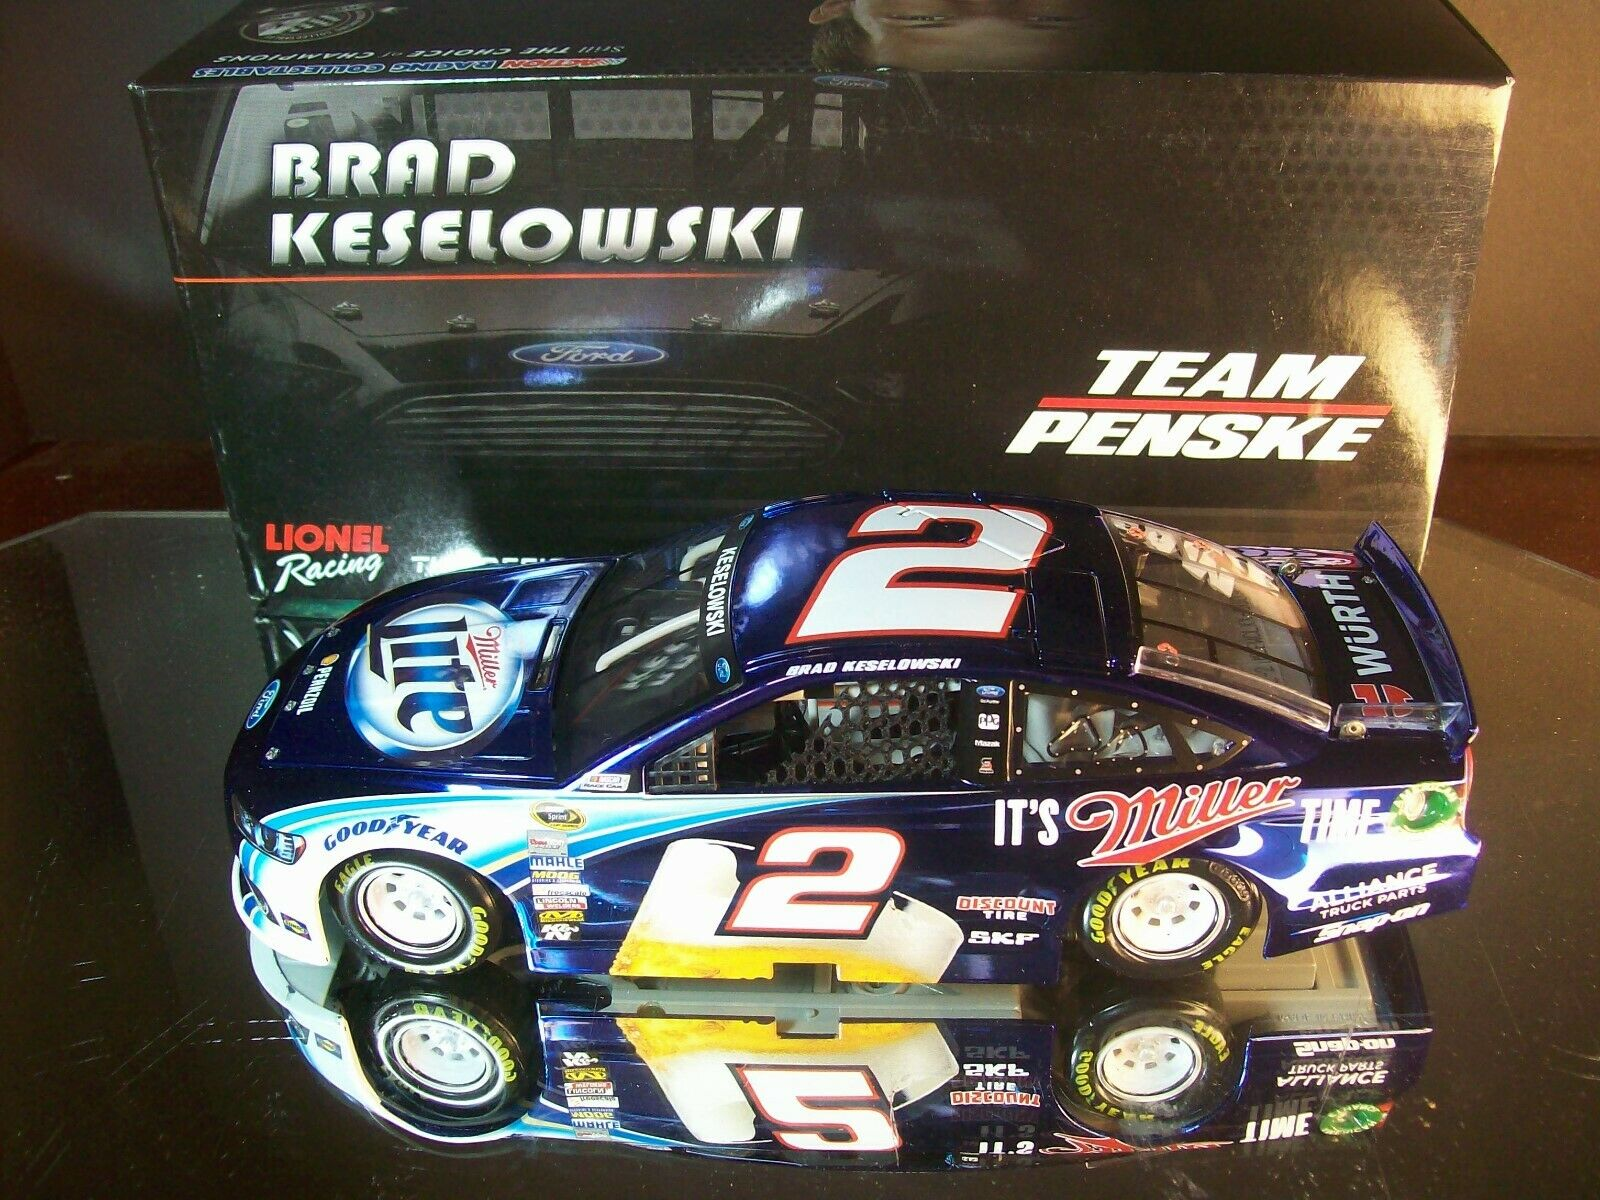 benvenuto a comprare Brad Keselowski  2 Miller Miller Miller Lite Coloreeee Chrome 2014 Ford Fusion 1 of 72 DIN  37  negozio outlet